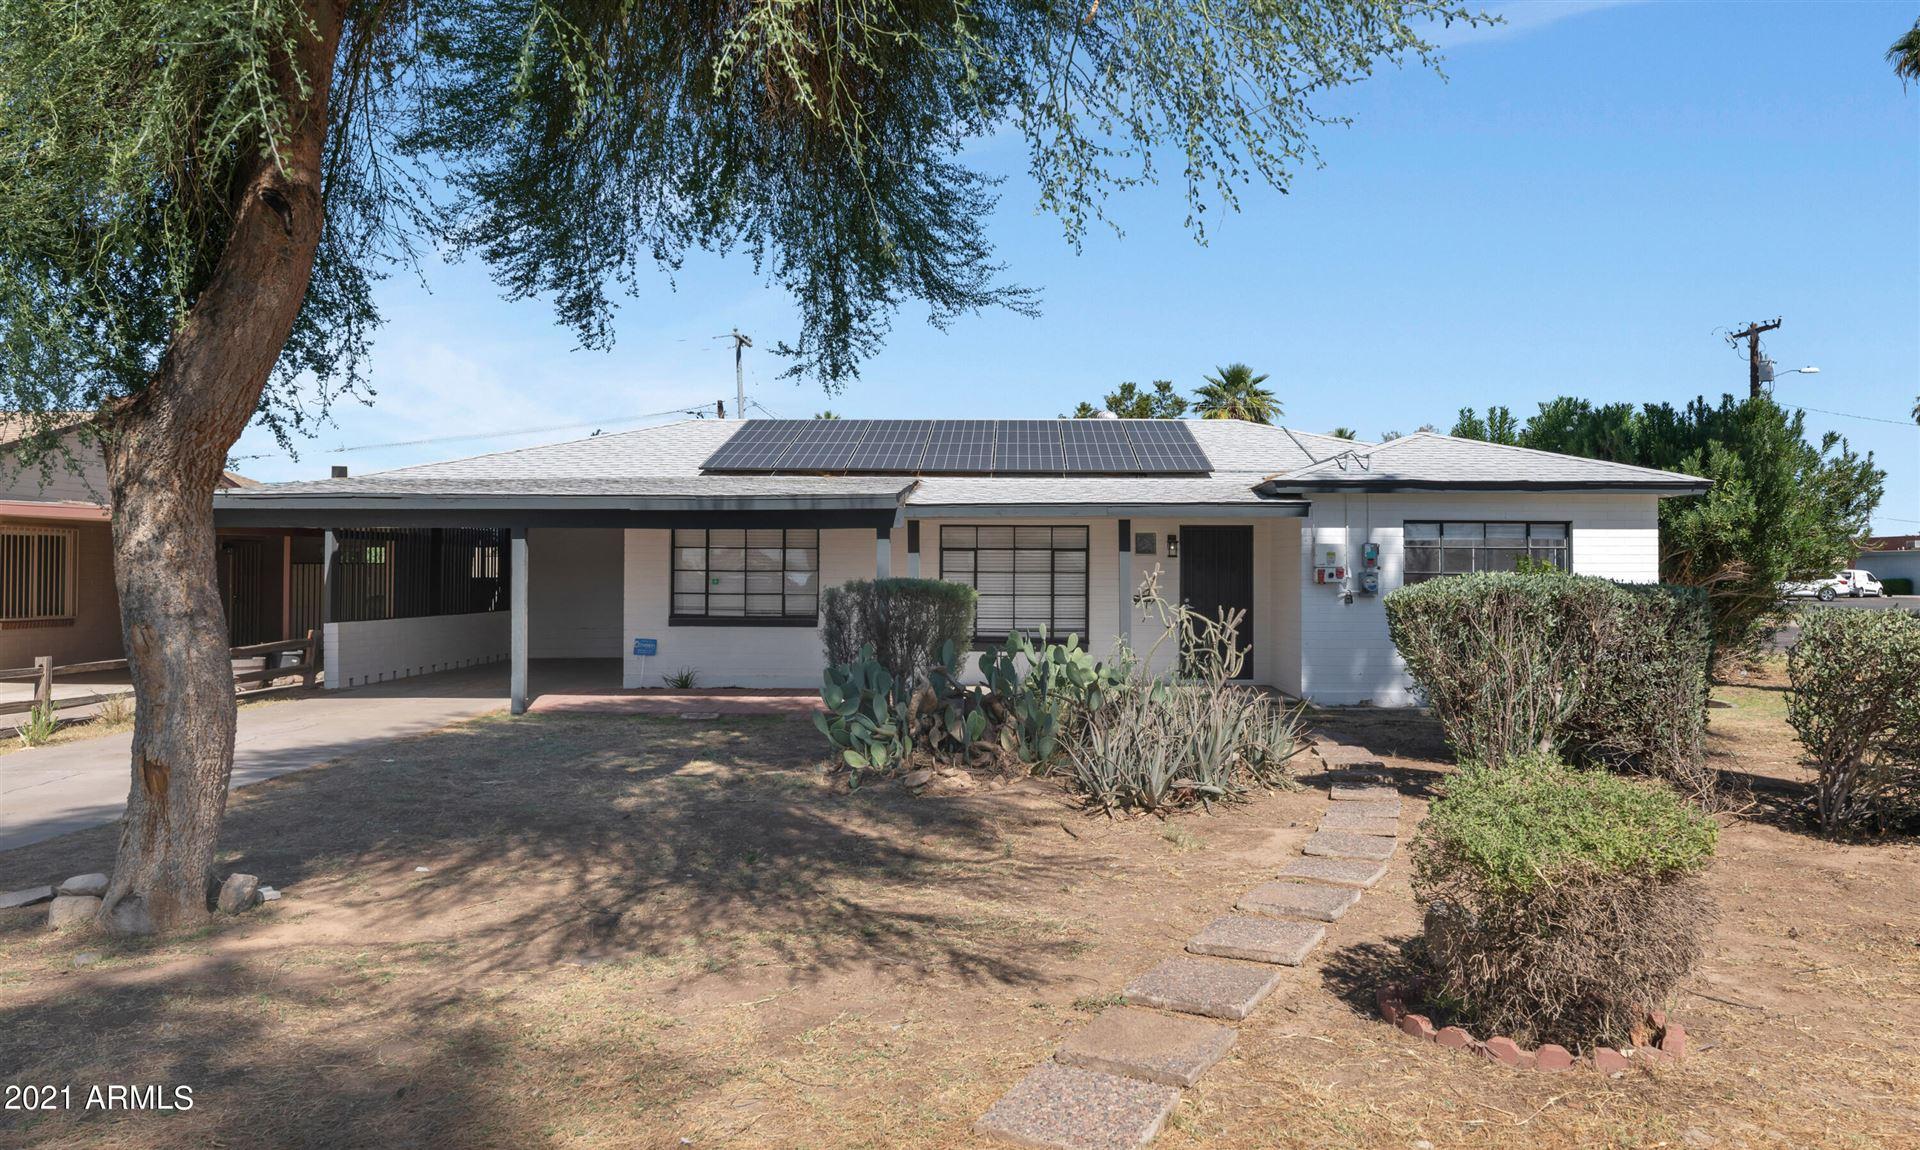 Photo of 5702 W ORANGEWOOD Avenue, Glendale, AZ 85301 (MLS # 6307161)